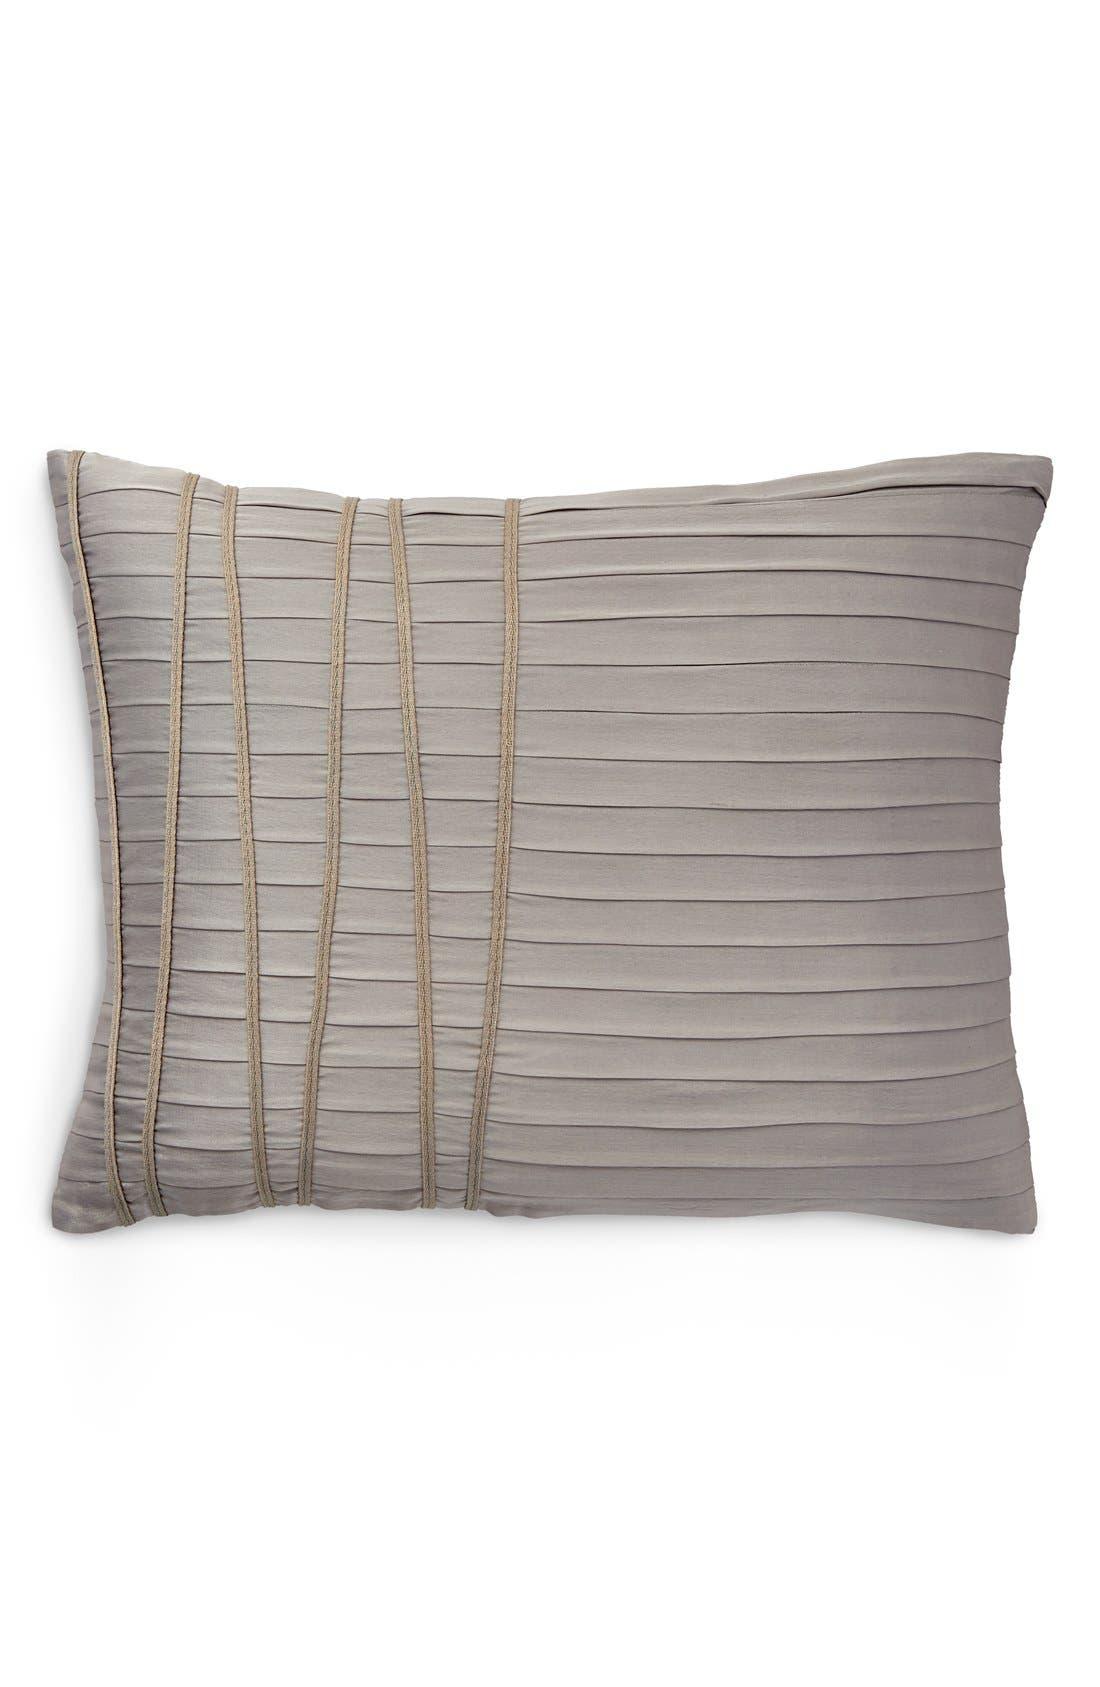 DONNA KARAN NEW YORK,                             Donna Karan Collection 'Reflection' Accent Pillow,                             Main thumbnail 1, color,                             SILVER